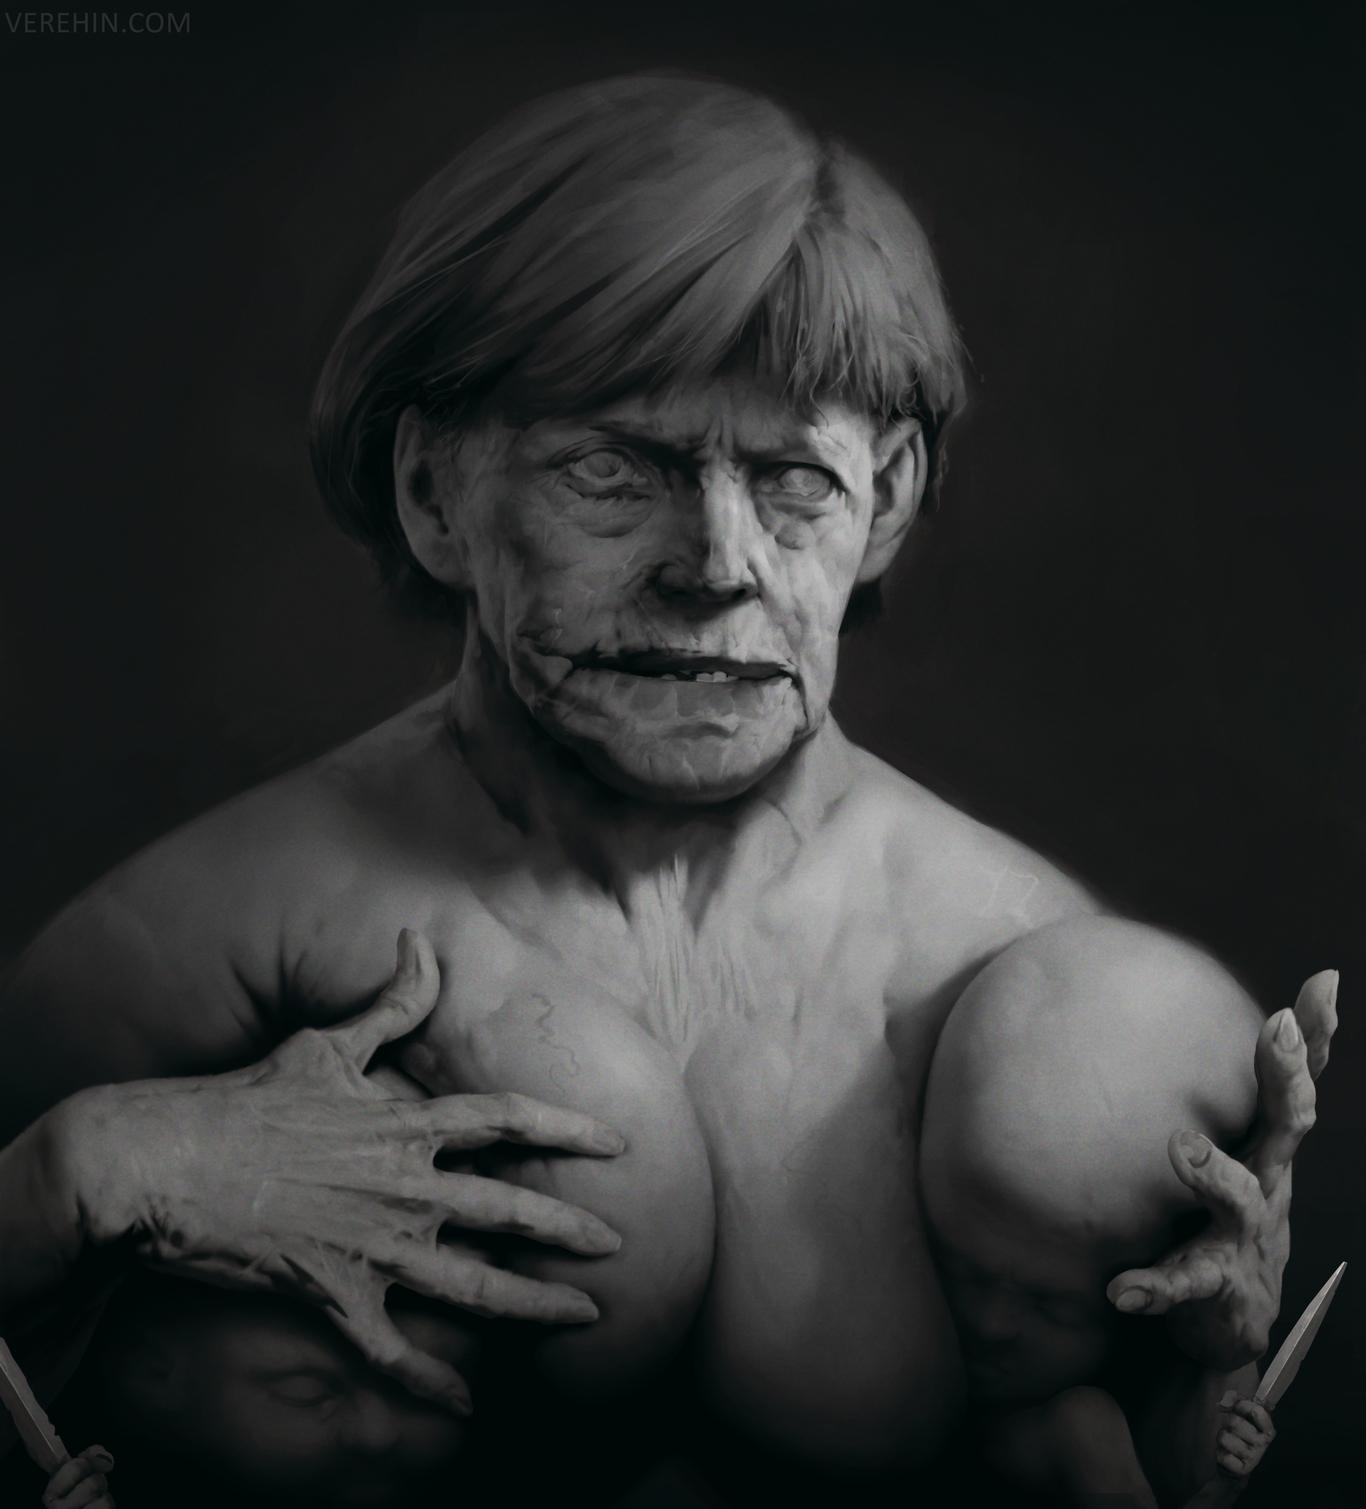 Maxverehin portrait 1 517bbc61 m61x